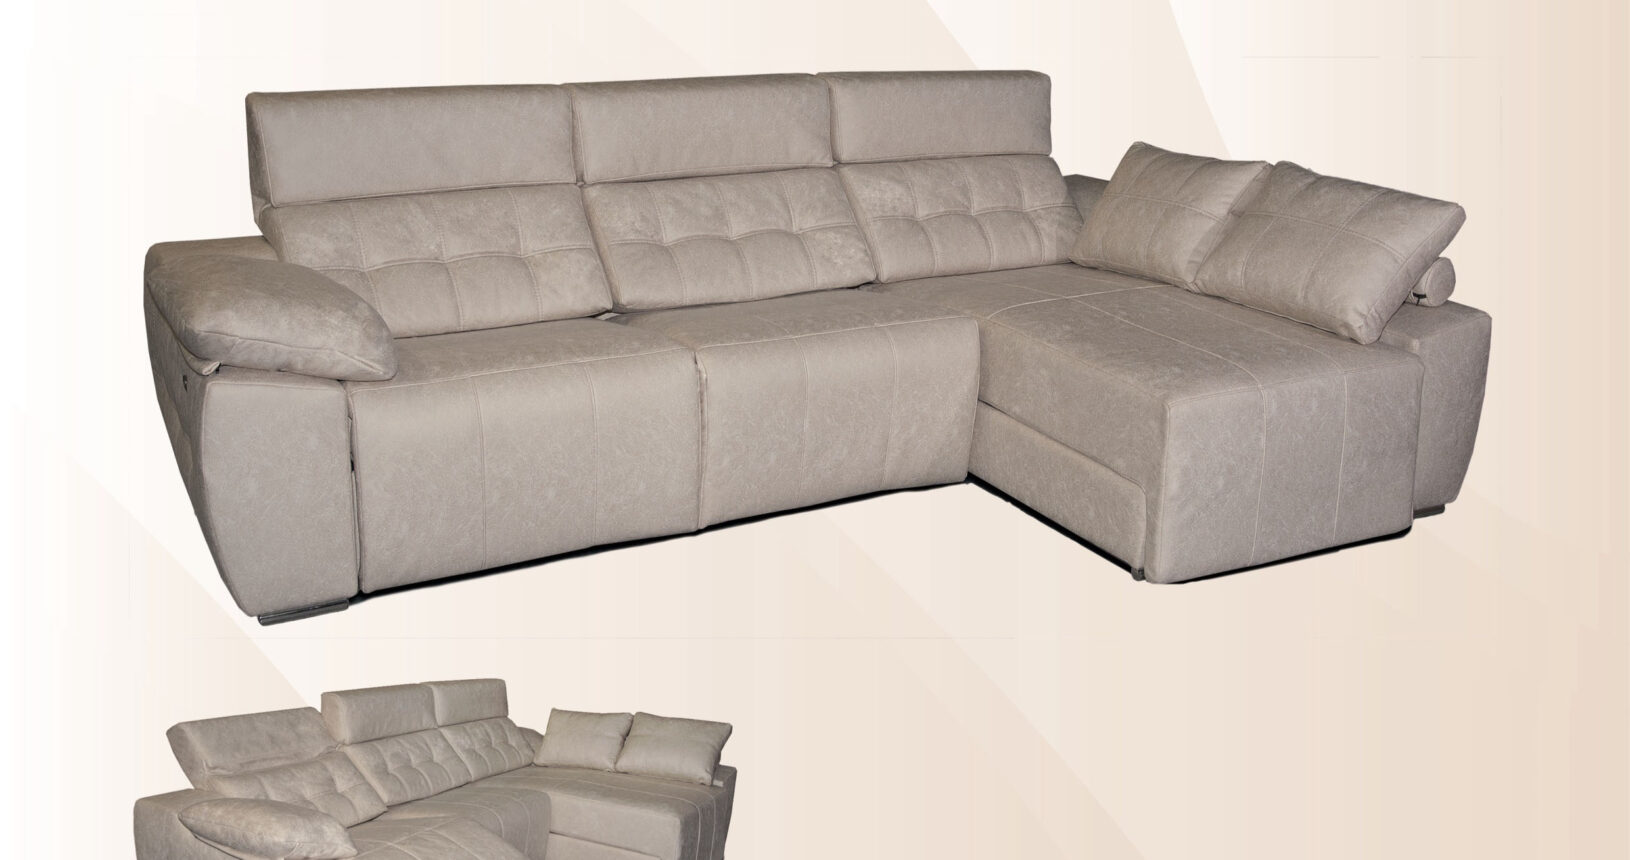 descanso sofás angel mundococina.eu